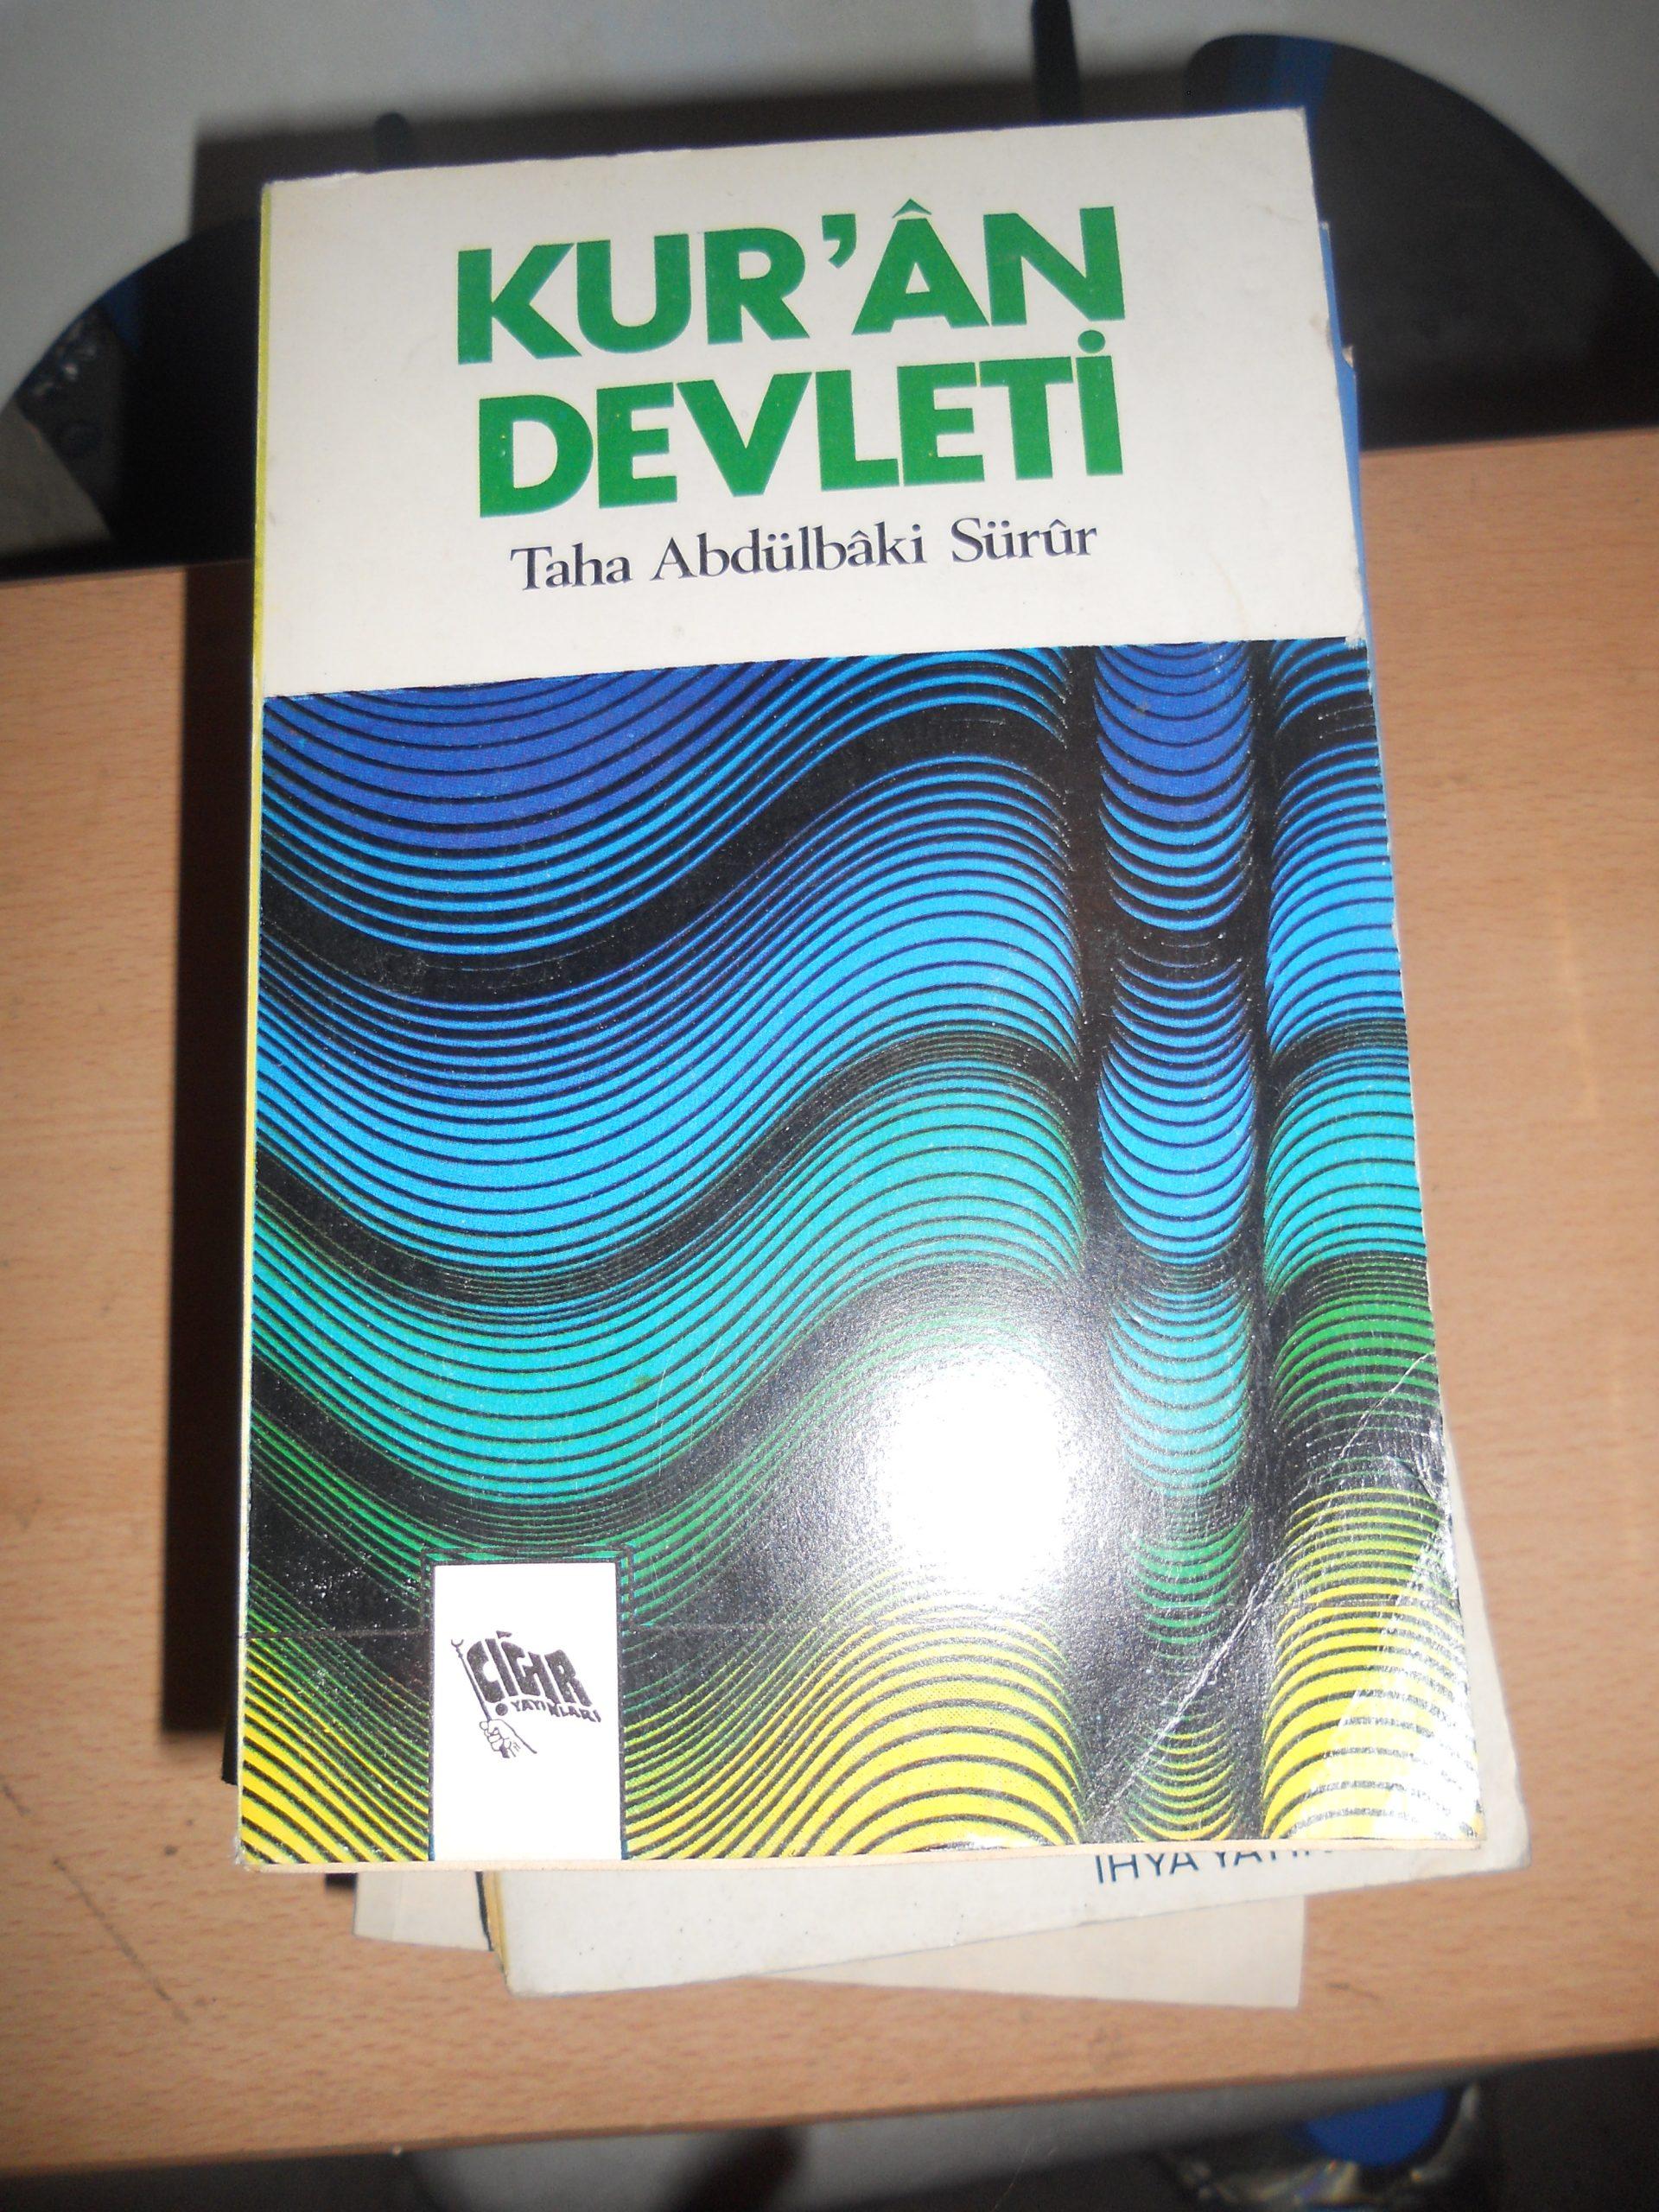 KUR'AN DEVLETİ/Taha Abdulbaki Sürur/10 tl